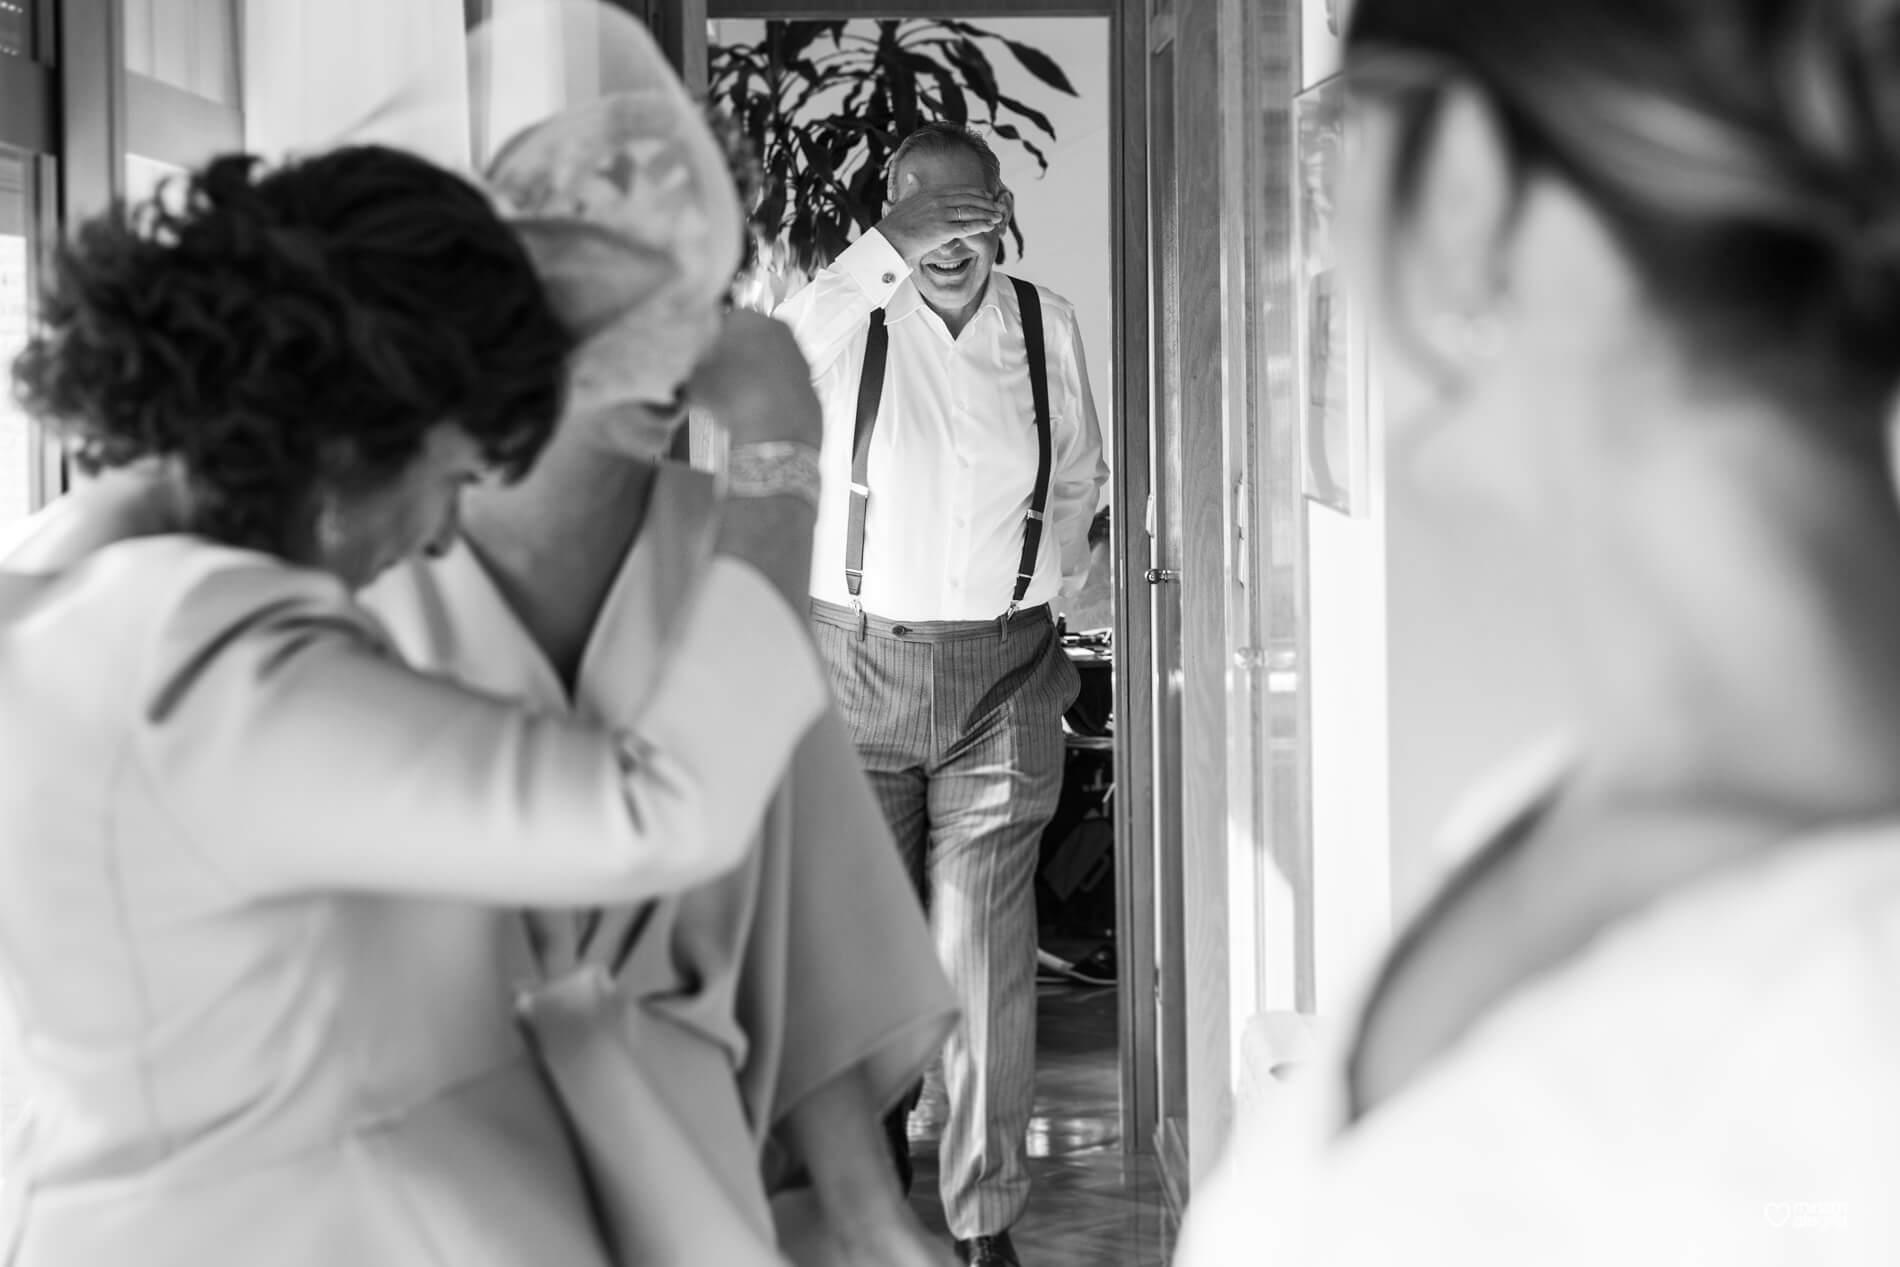 vestido-de-novia-paula-del-vas-miriam-alegria-fotografos-boda-murcia-23